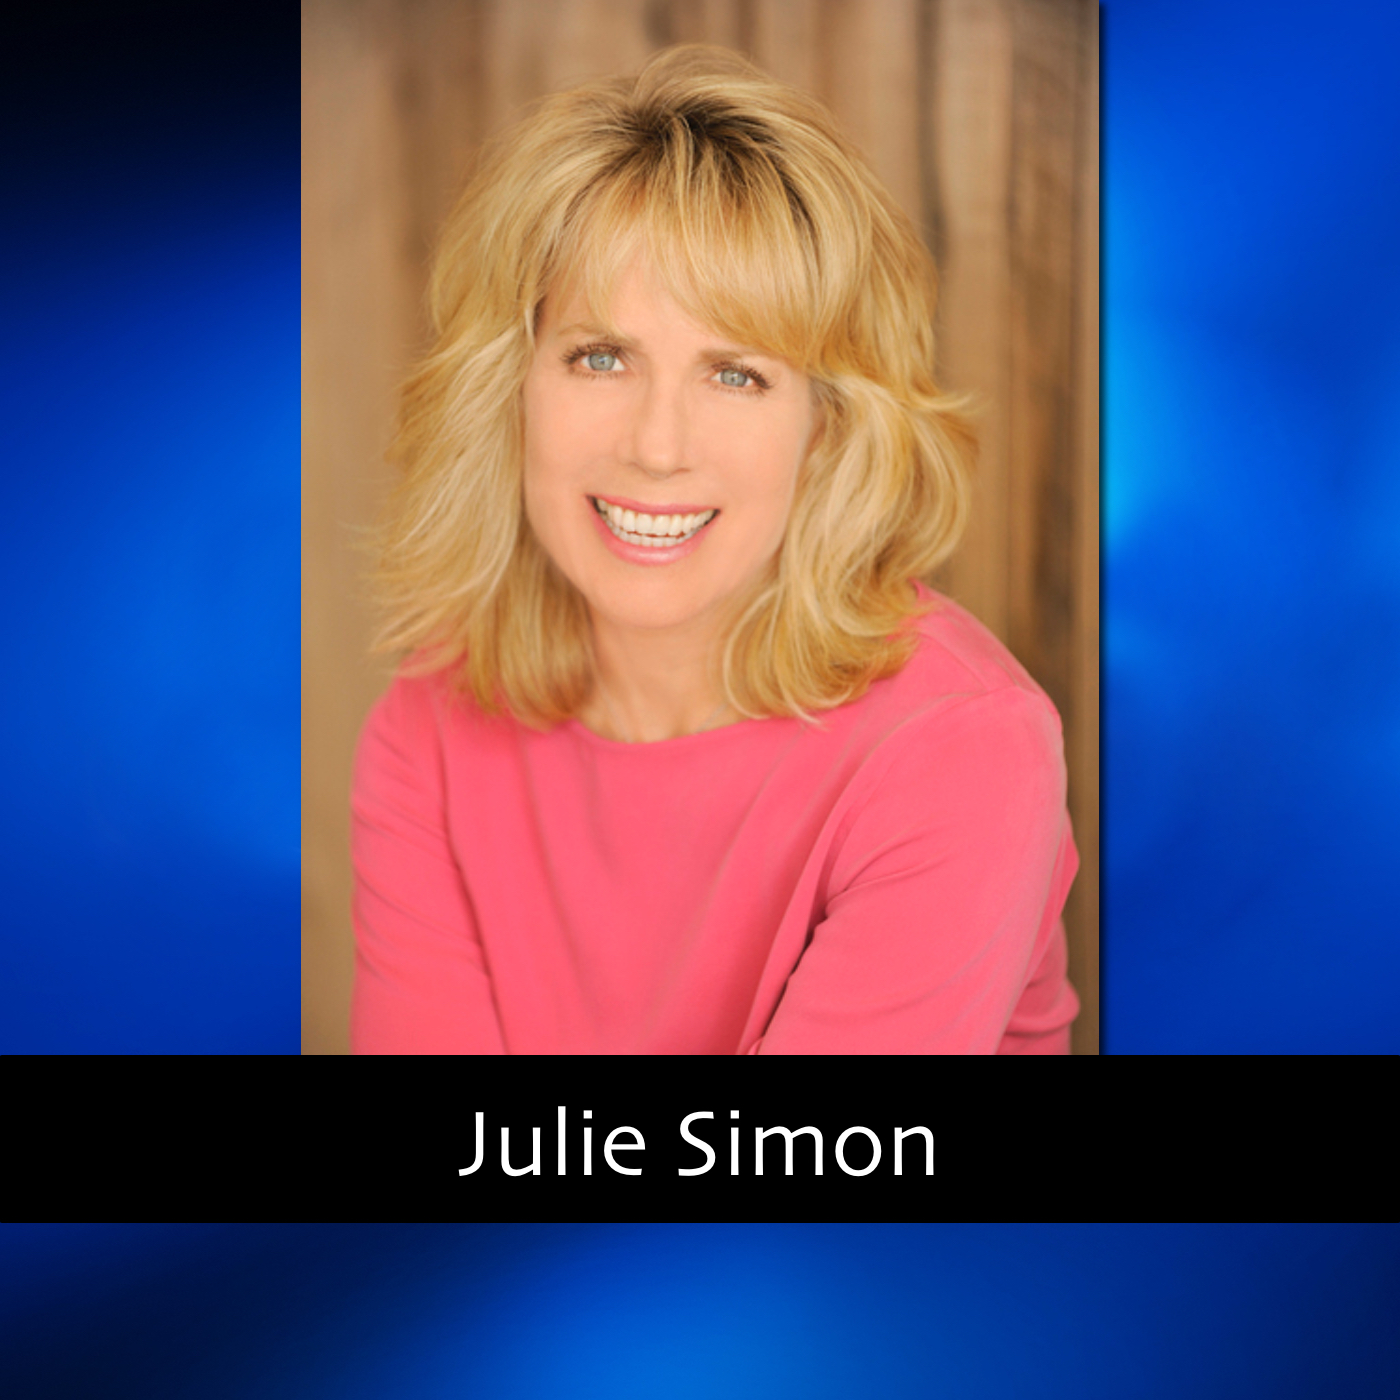 Julie Simon Thumb.jpg